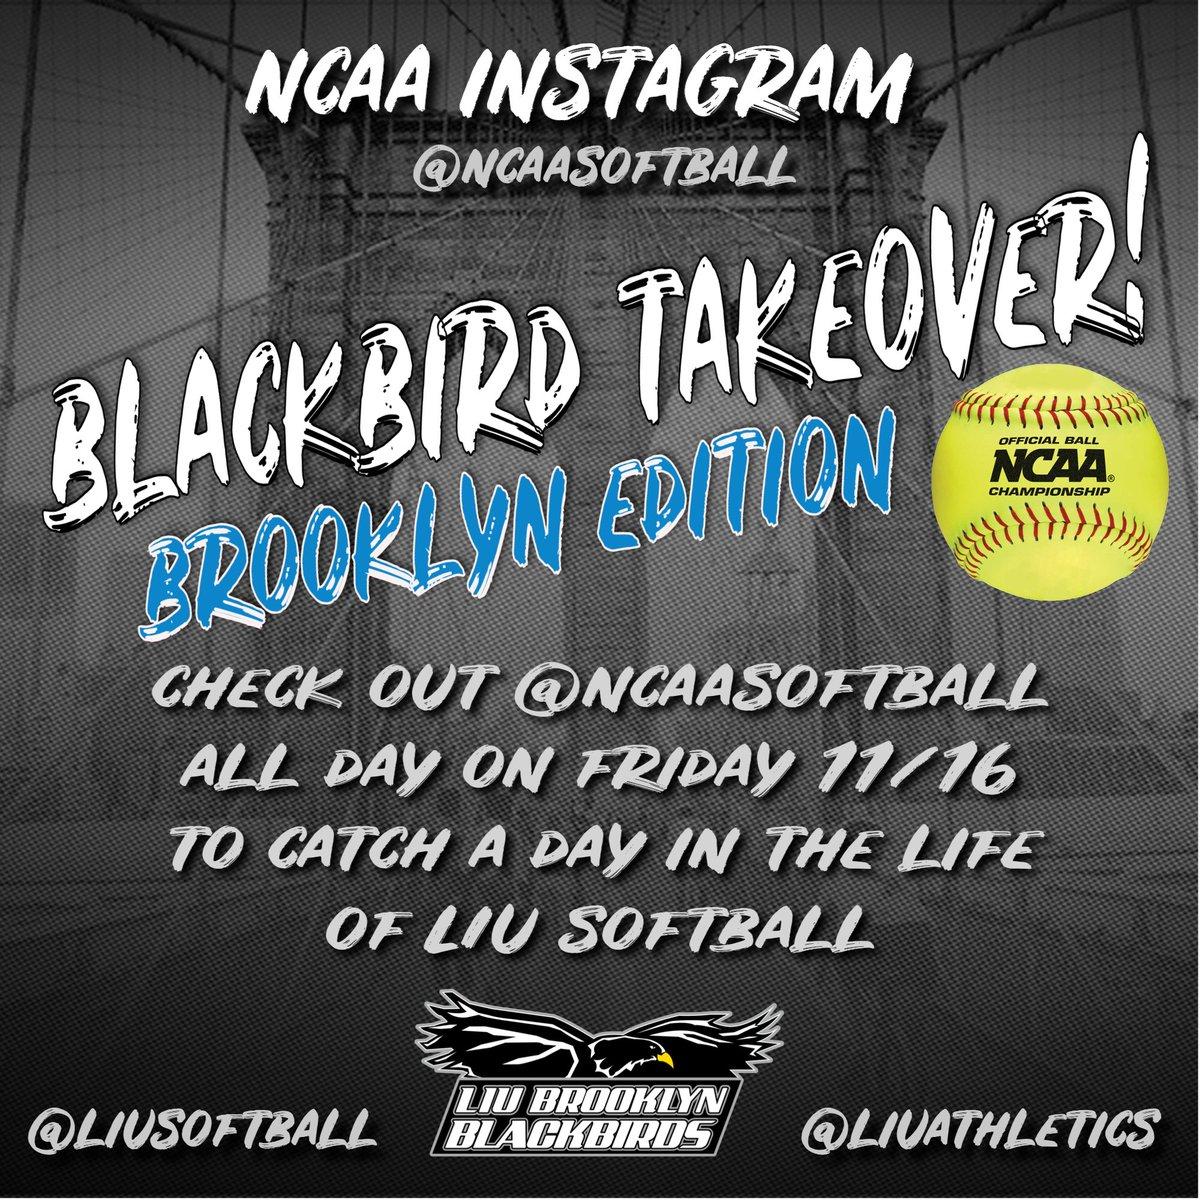 RT @LIUAthletics: Catch @LIUSoftball as they take over the @NCAAsoftball Instagram story today!!! 😎🥎🐦 https://t.co/E0M4BtqSOr